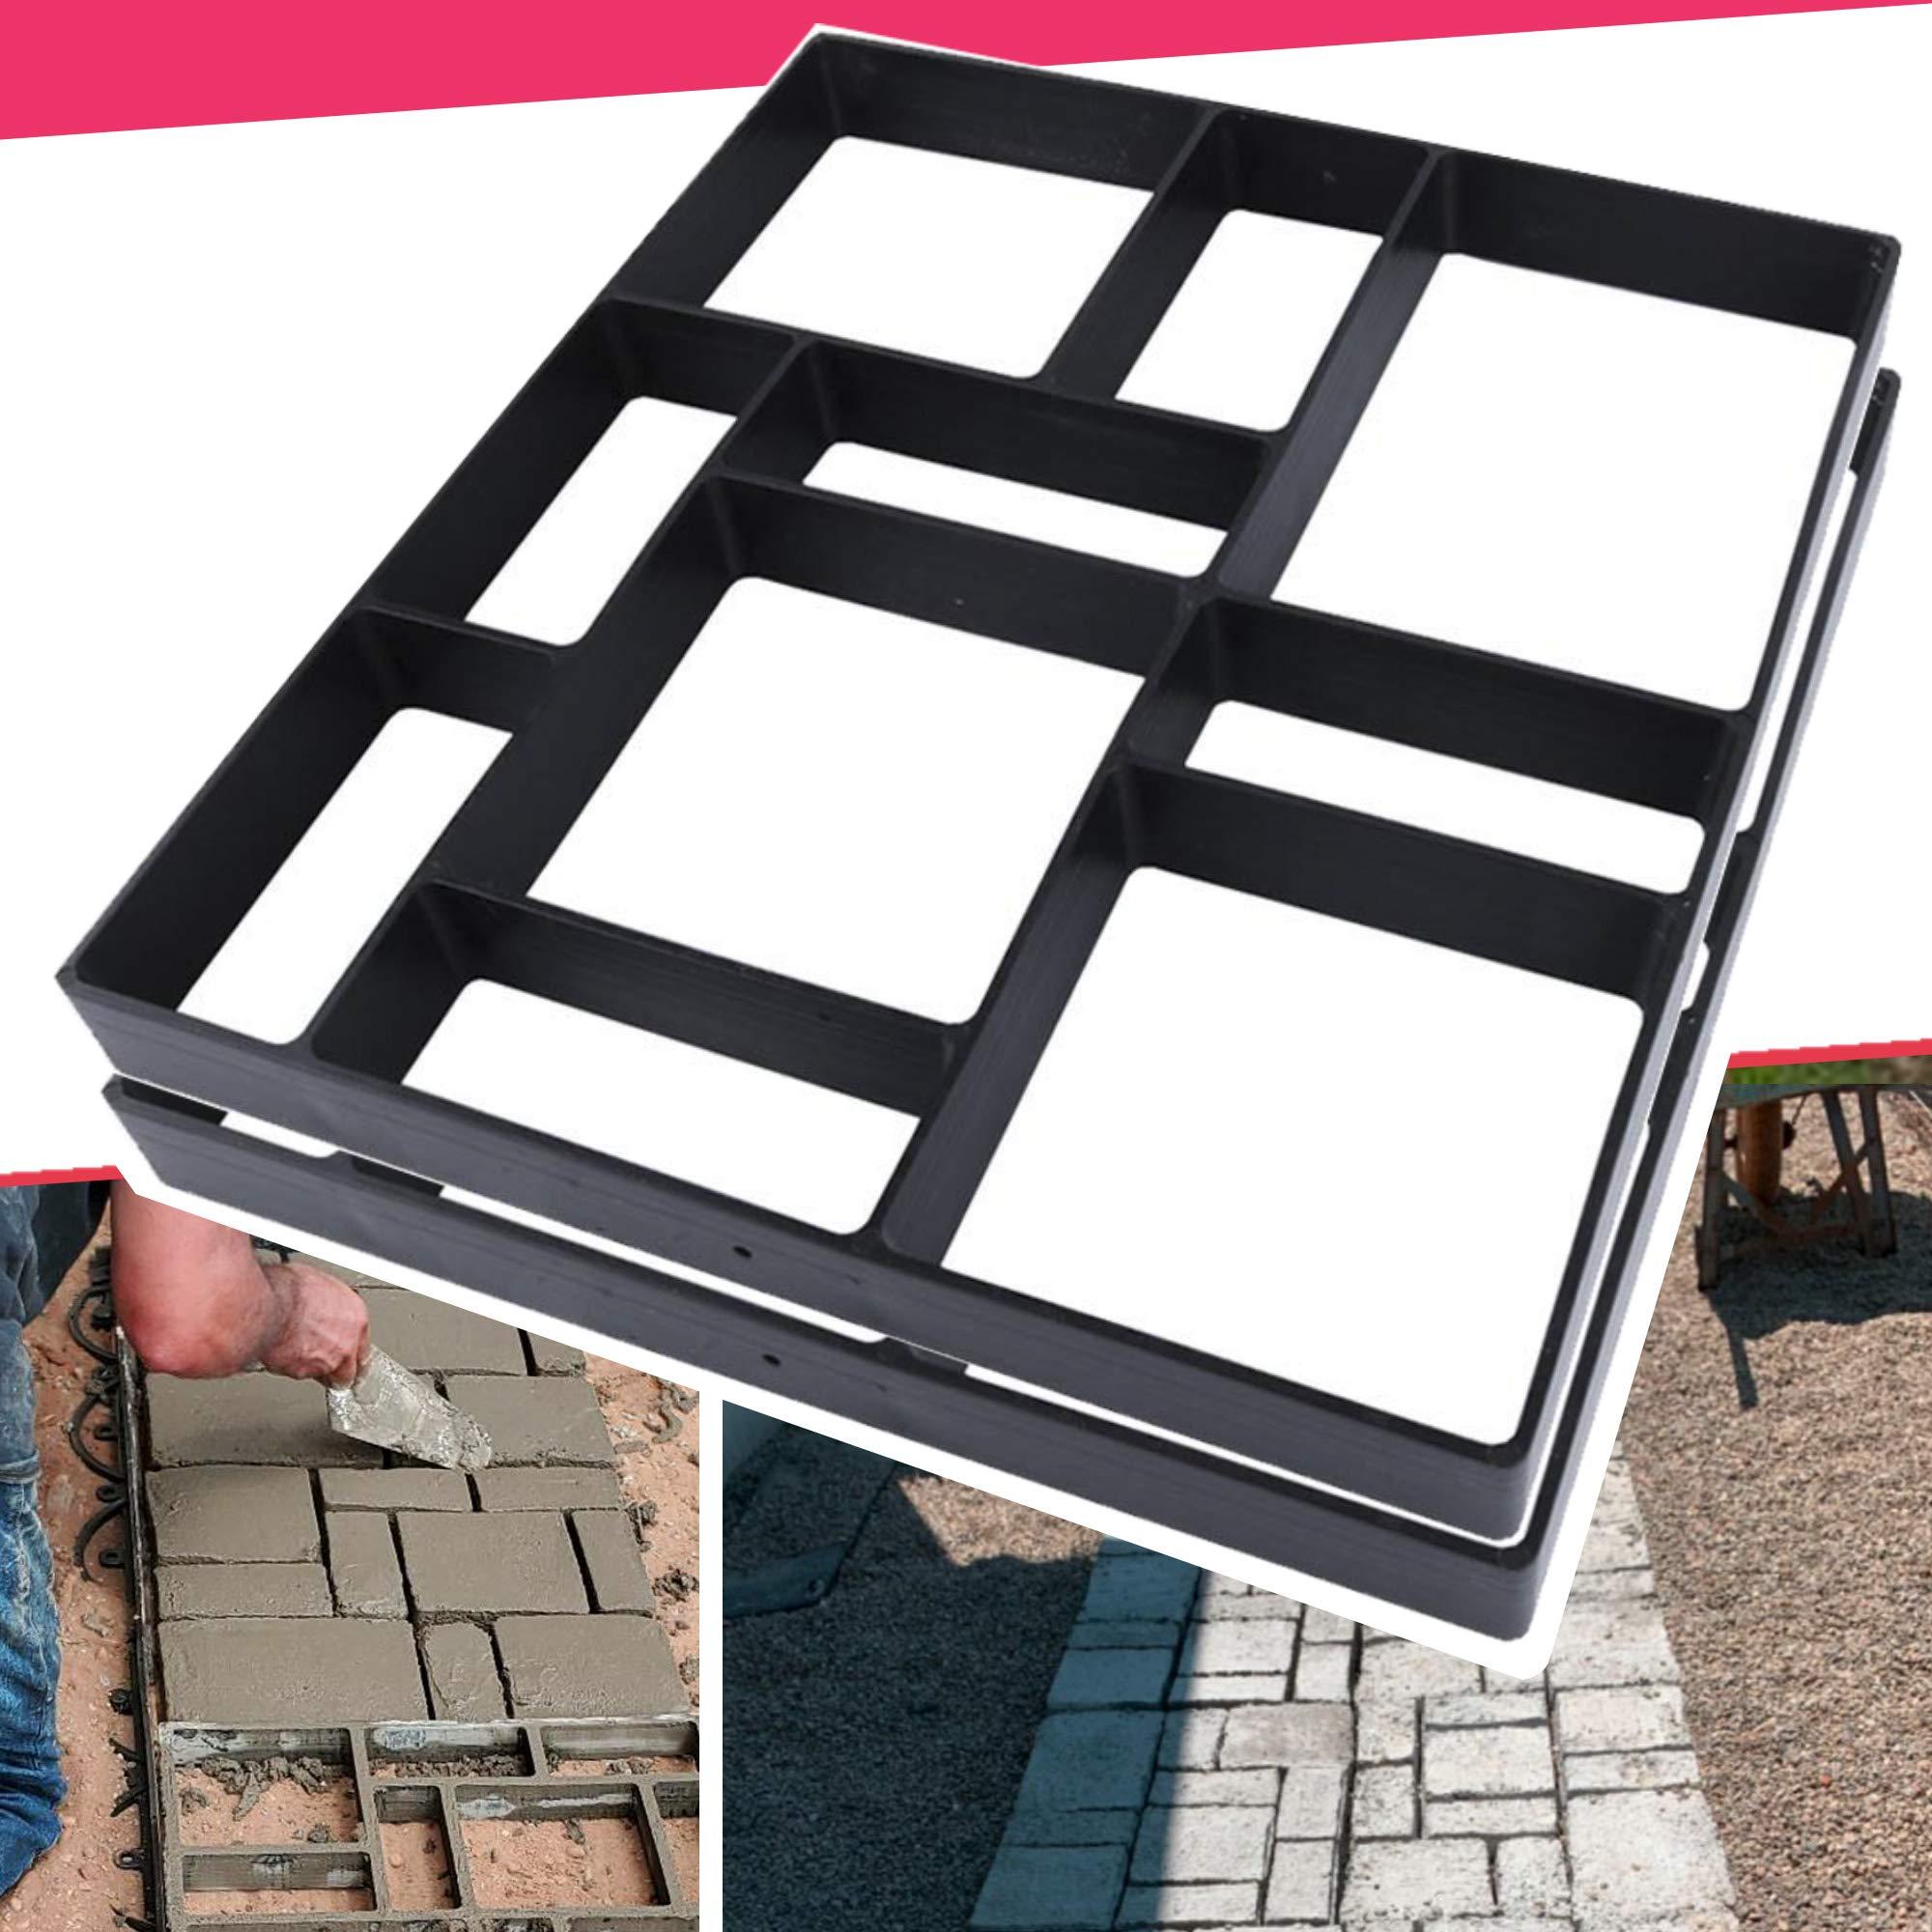 "Anothera 17.5""x15.5""x1.5"" 2Pack Concrete Molds Reusable Walk Path Maker Paving DIY Path Garden Yard Patio Mold (10-Grid)…"